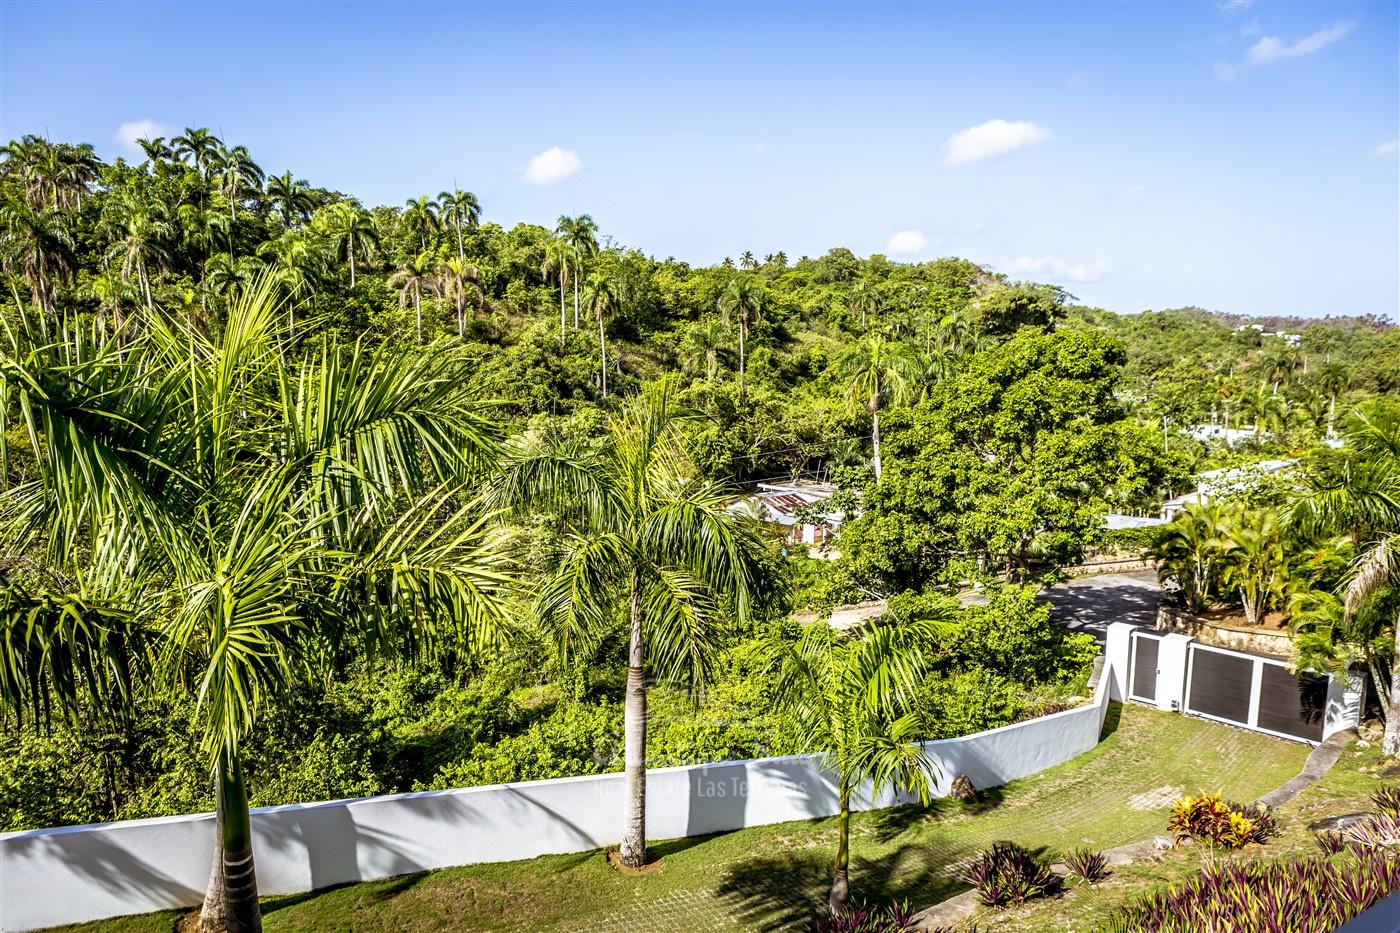 Modern Villa on a hill with ocean views Real Estate Las Terrenas Dominican Republic7.jpg